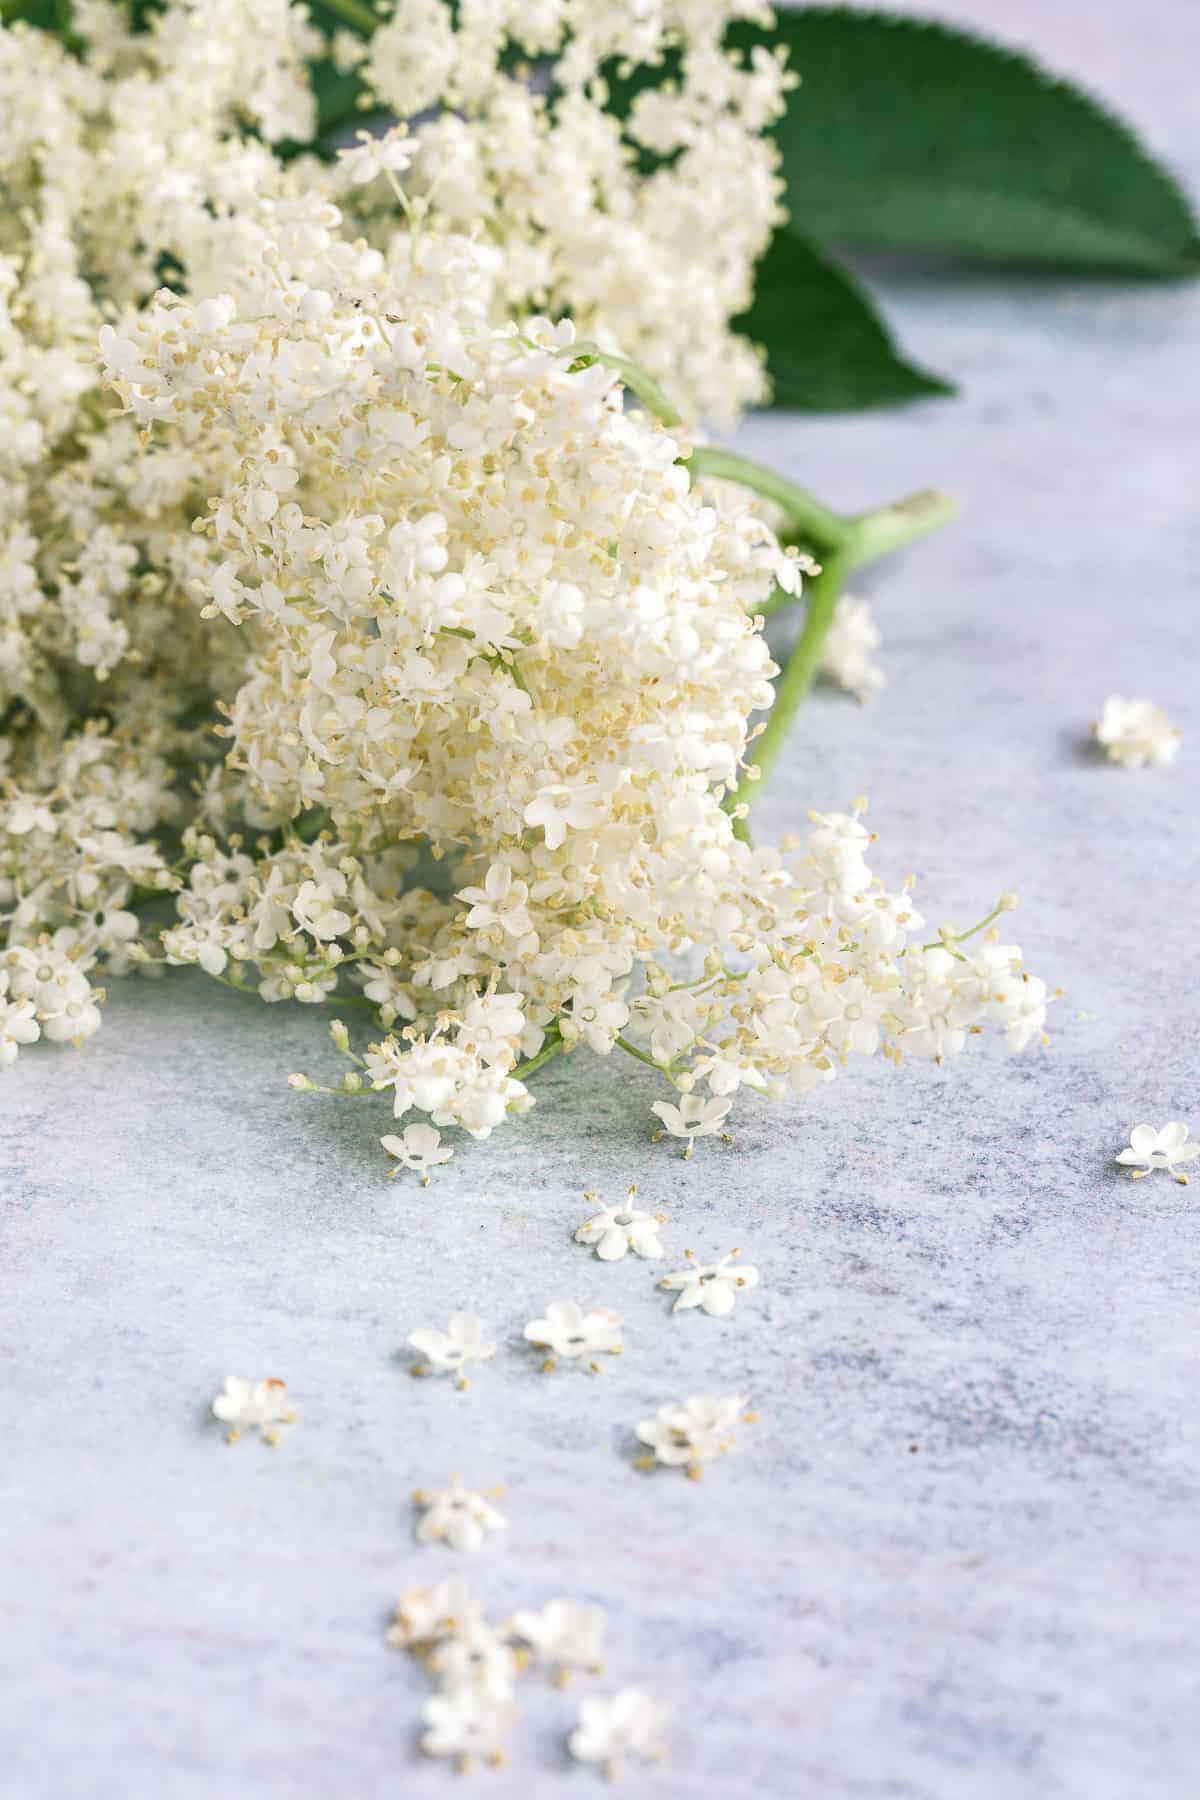 The creamy white flower of elderflower.